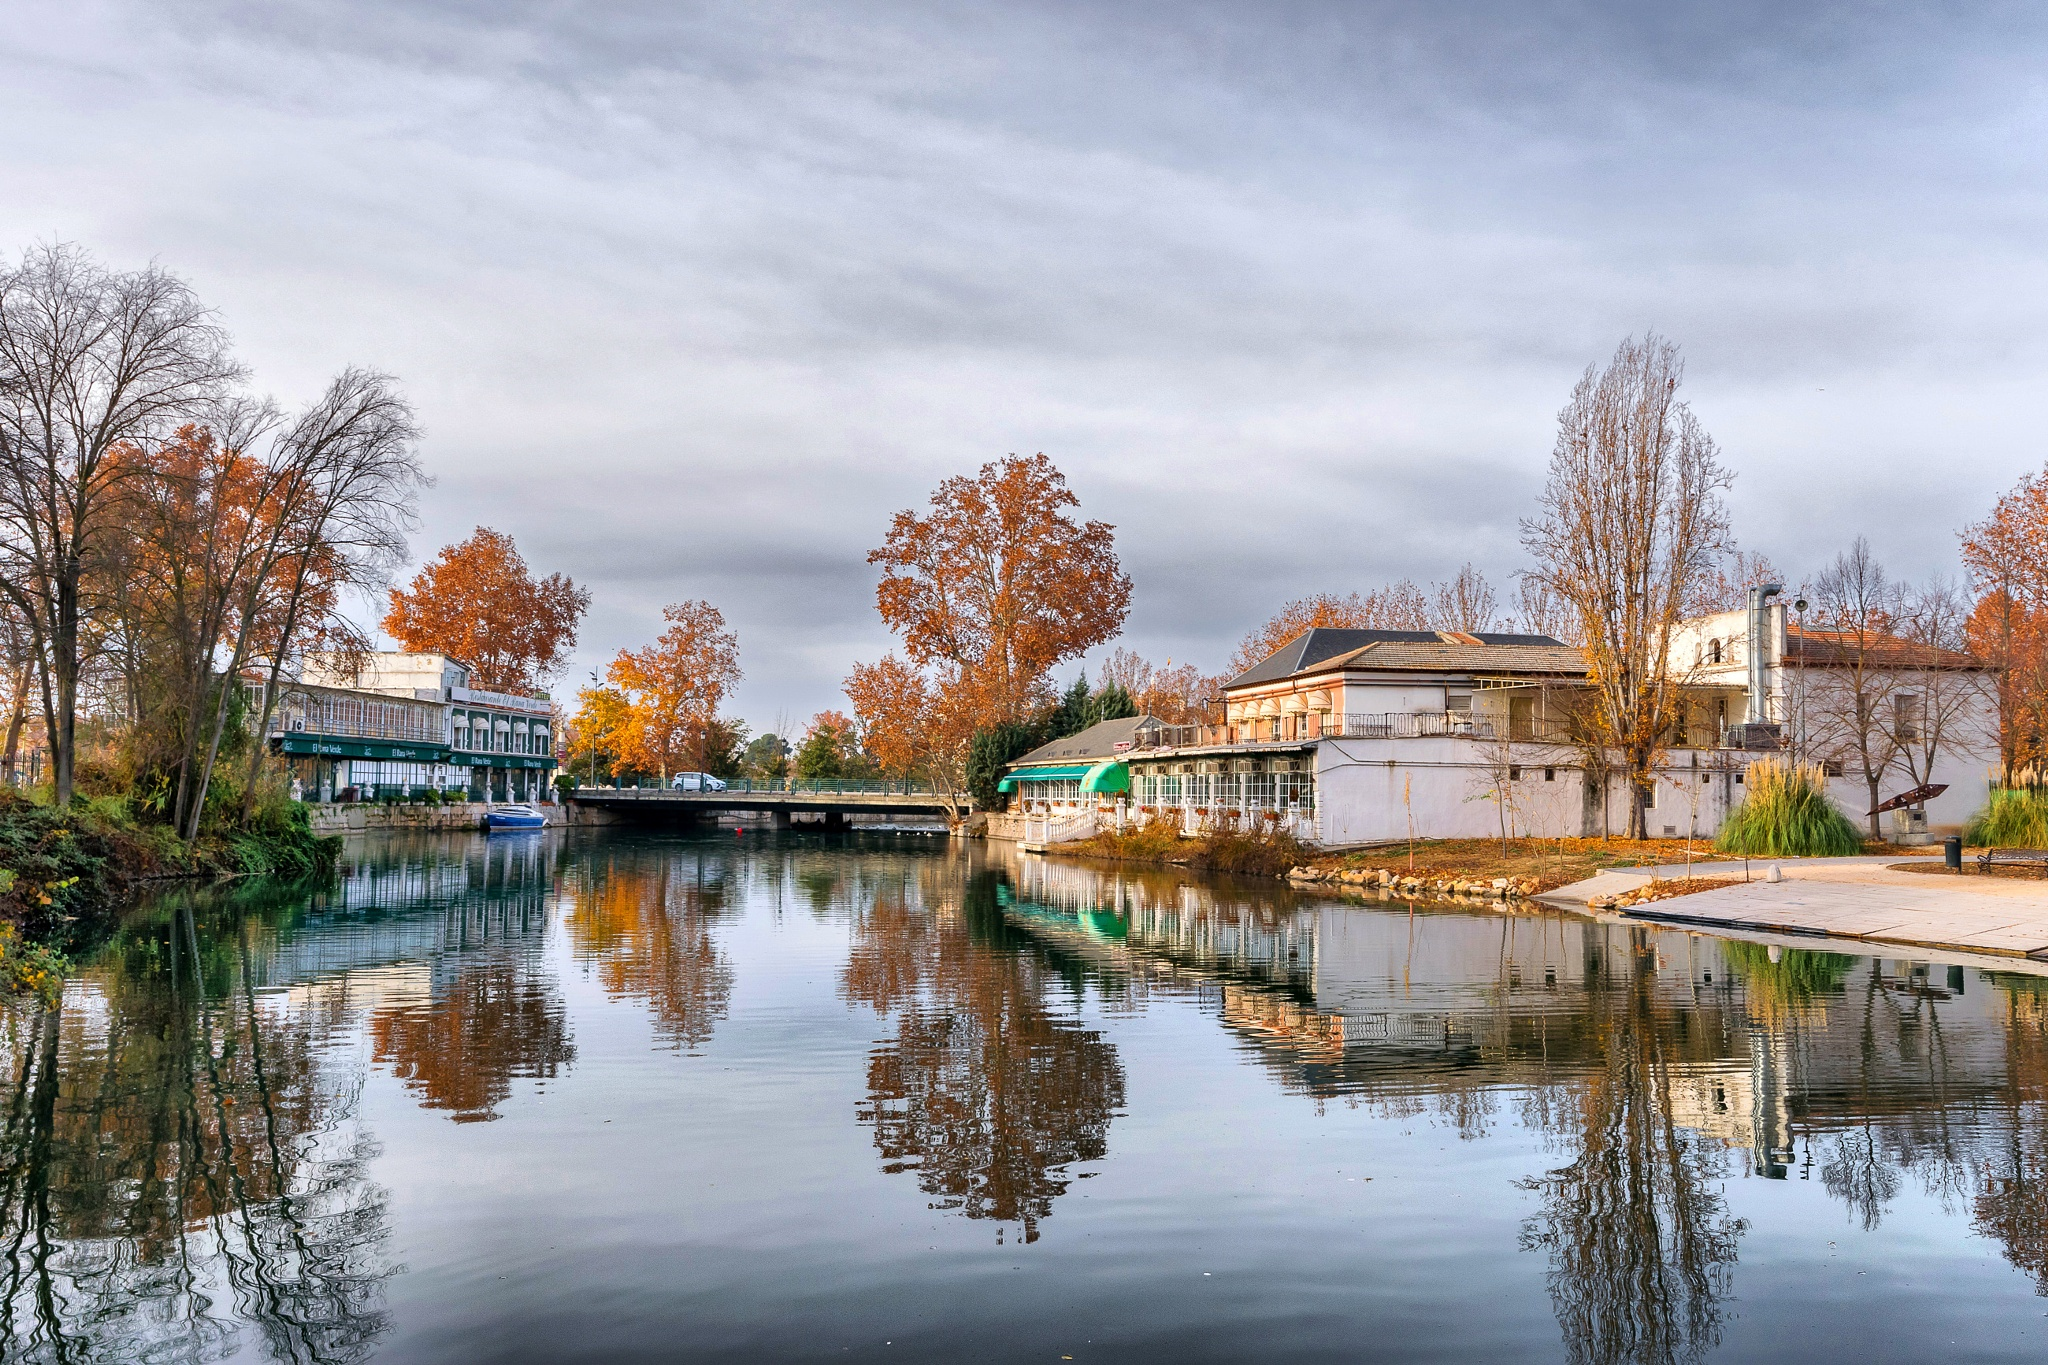 Aranjuez by julio rubio